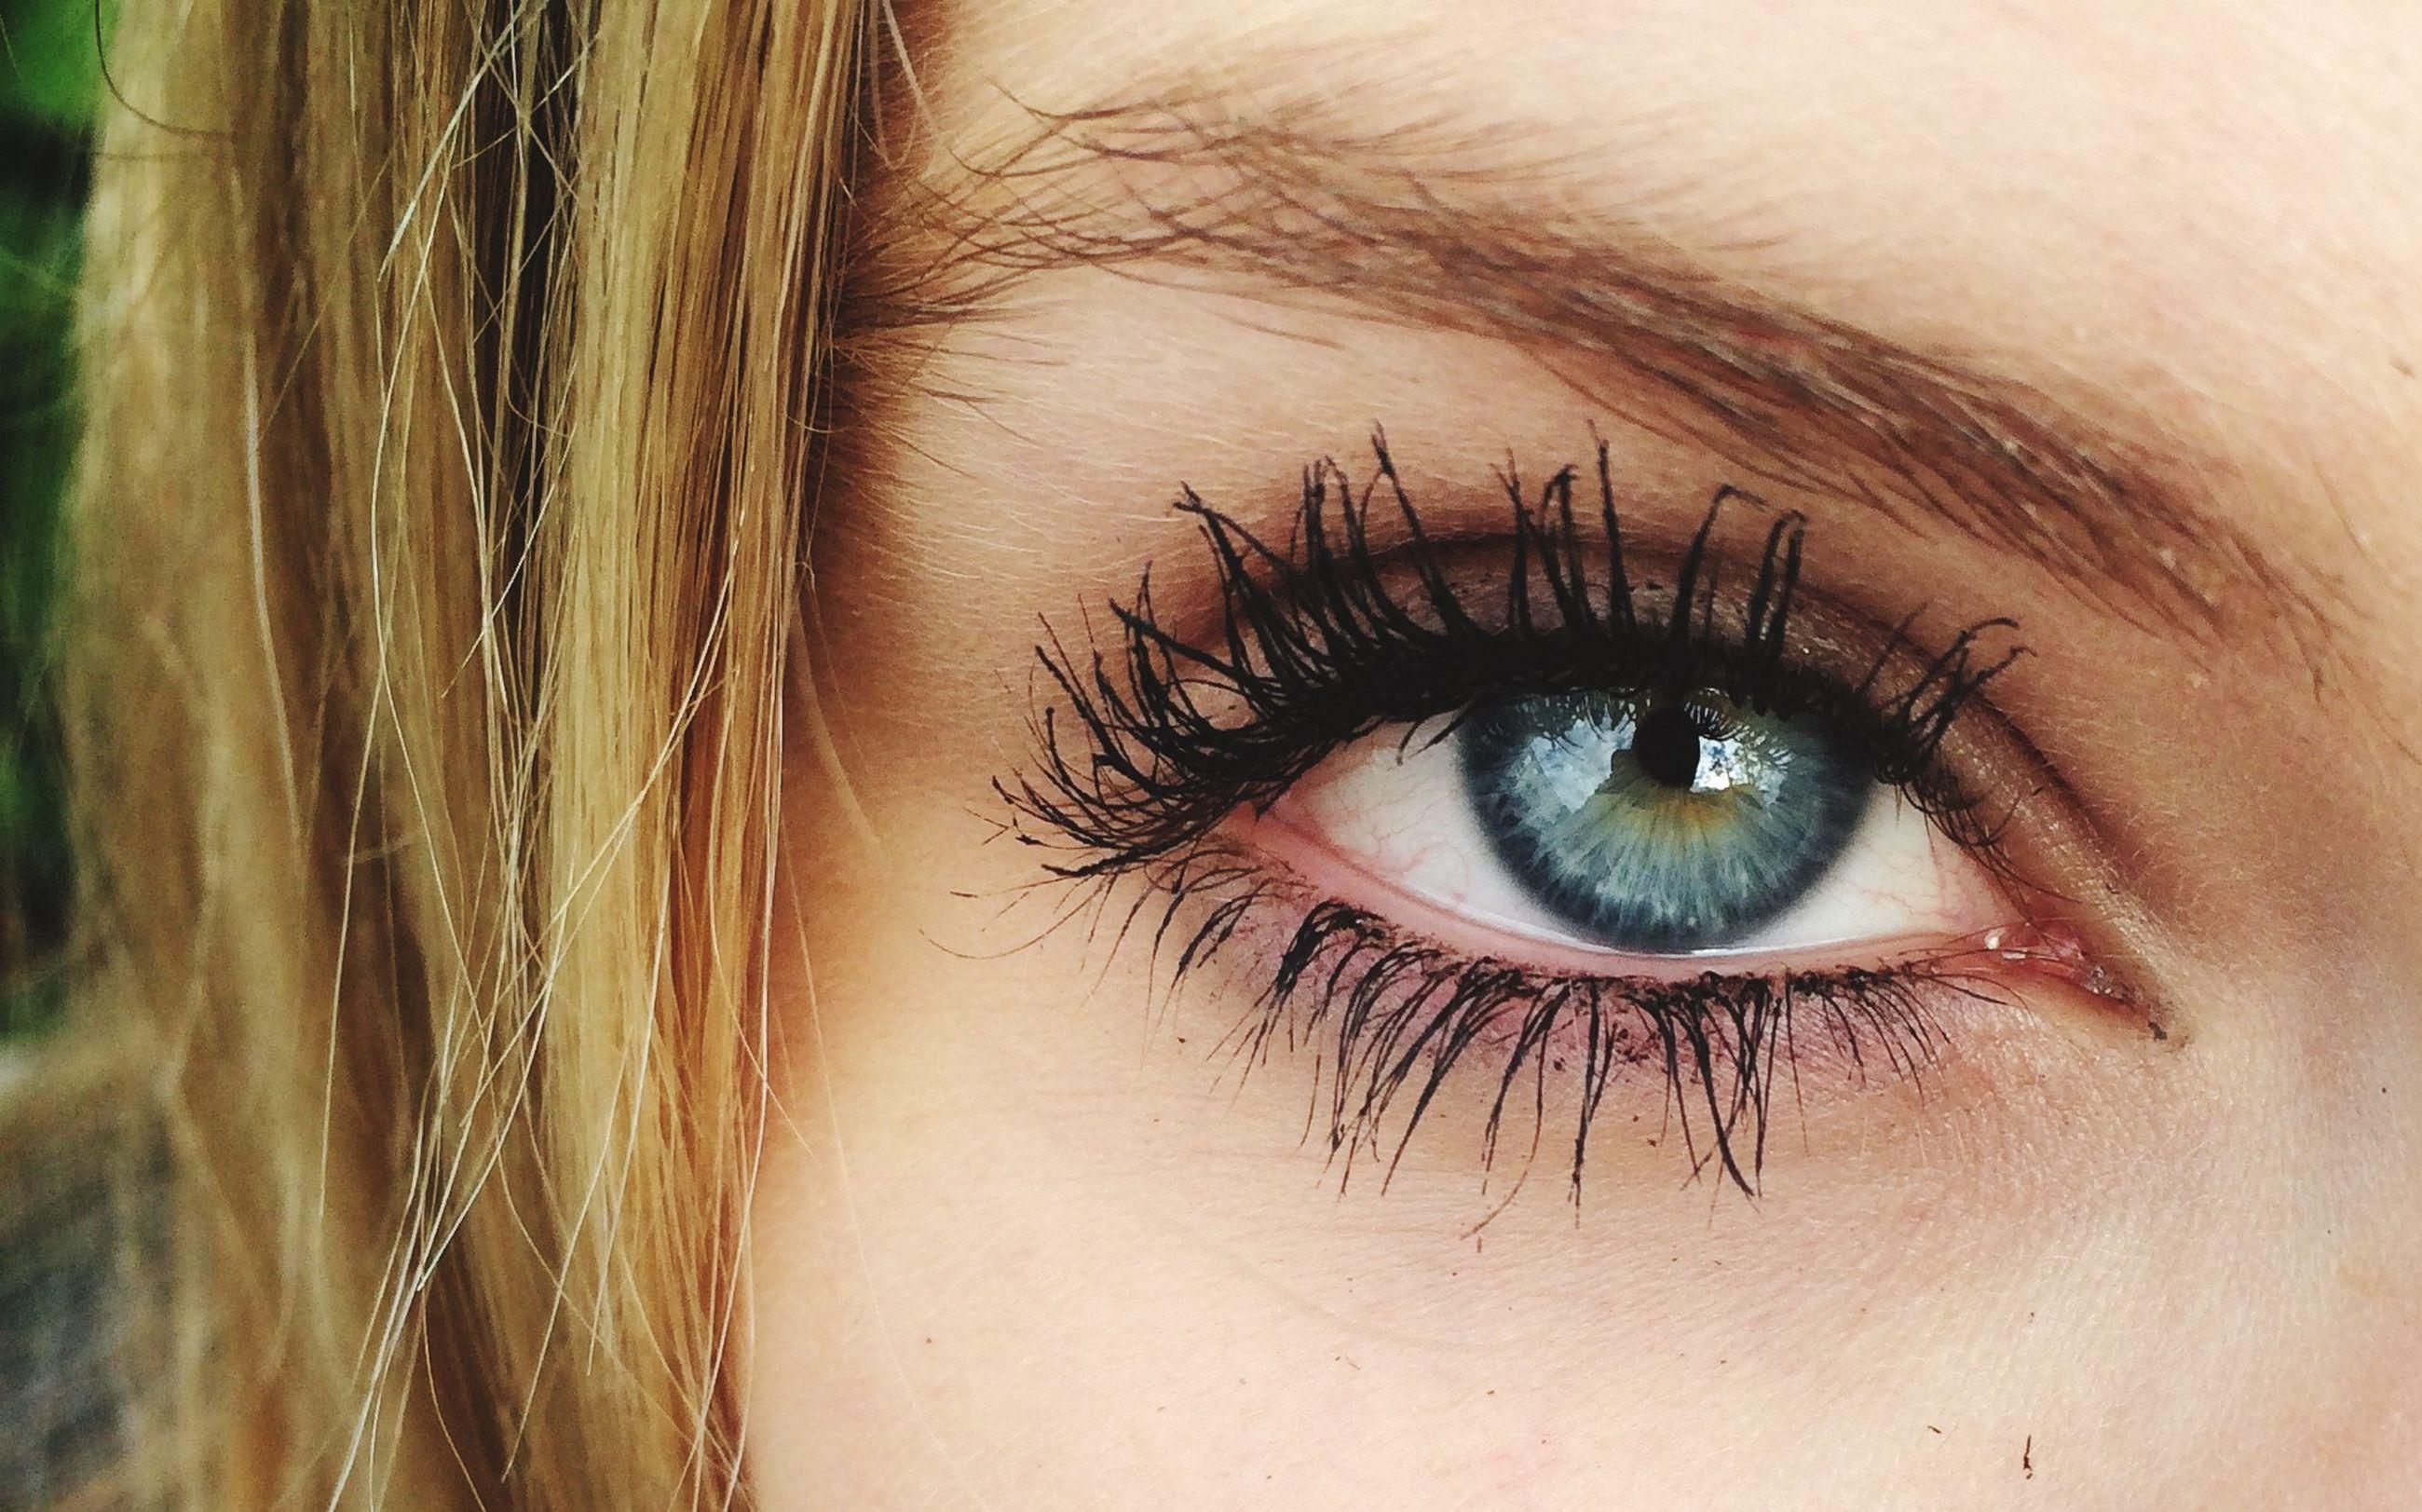 human eye, eyelash, close-up, eyesight, looking at camera, human skin, portrait, sensory perception, human face, iris - eye, eyeball, eyebrow, part of, headshot, extreme close-up, lifestyles, vision